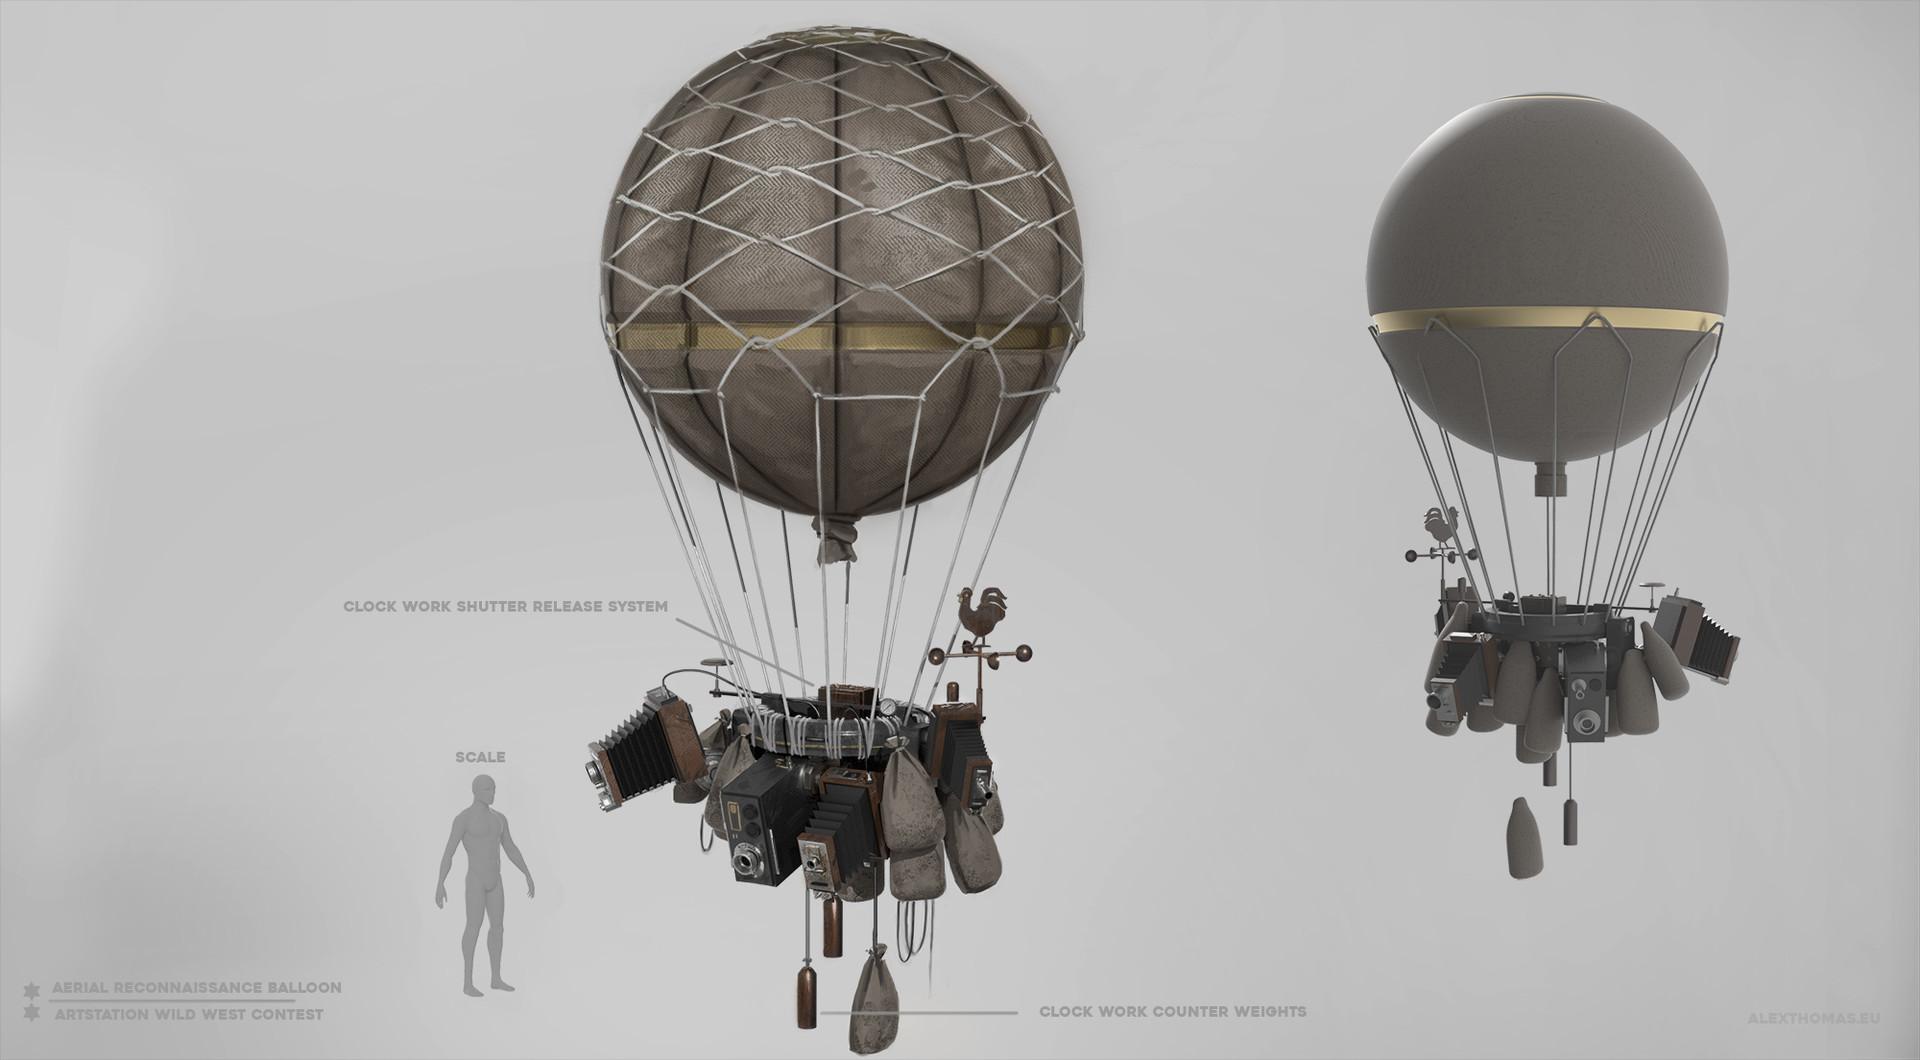 Alex thomas at wildwest aerialreconnaissanceballon fv1